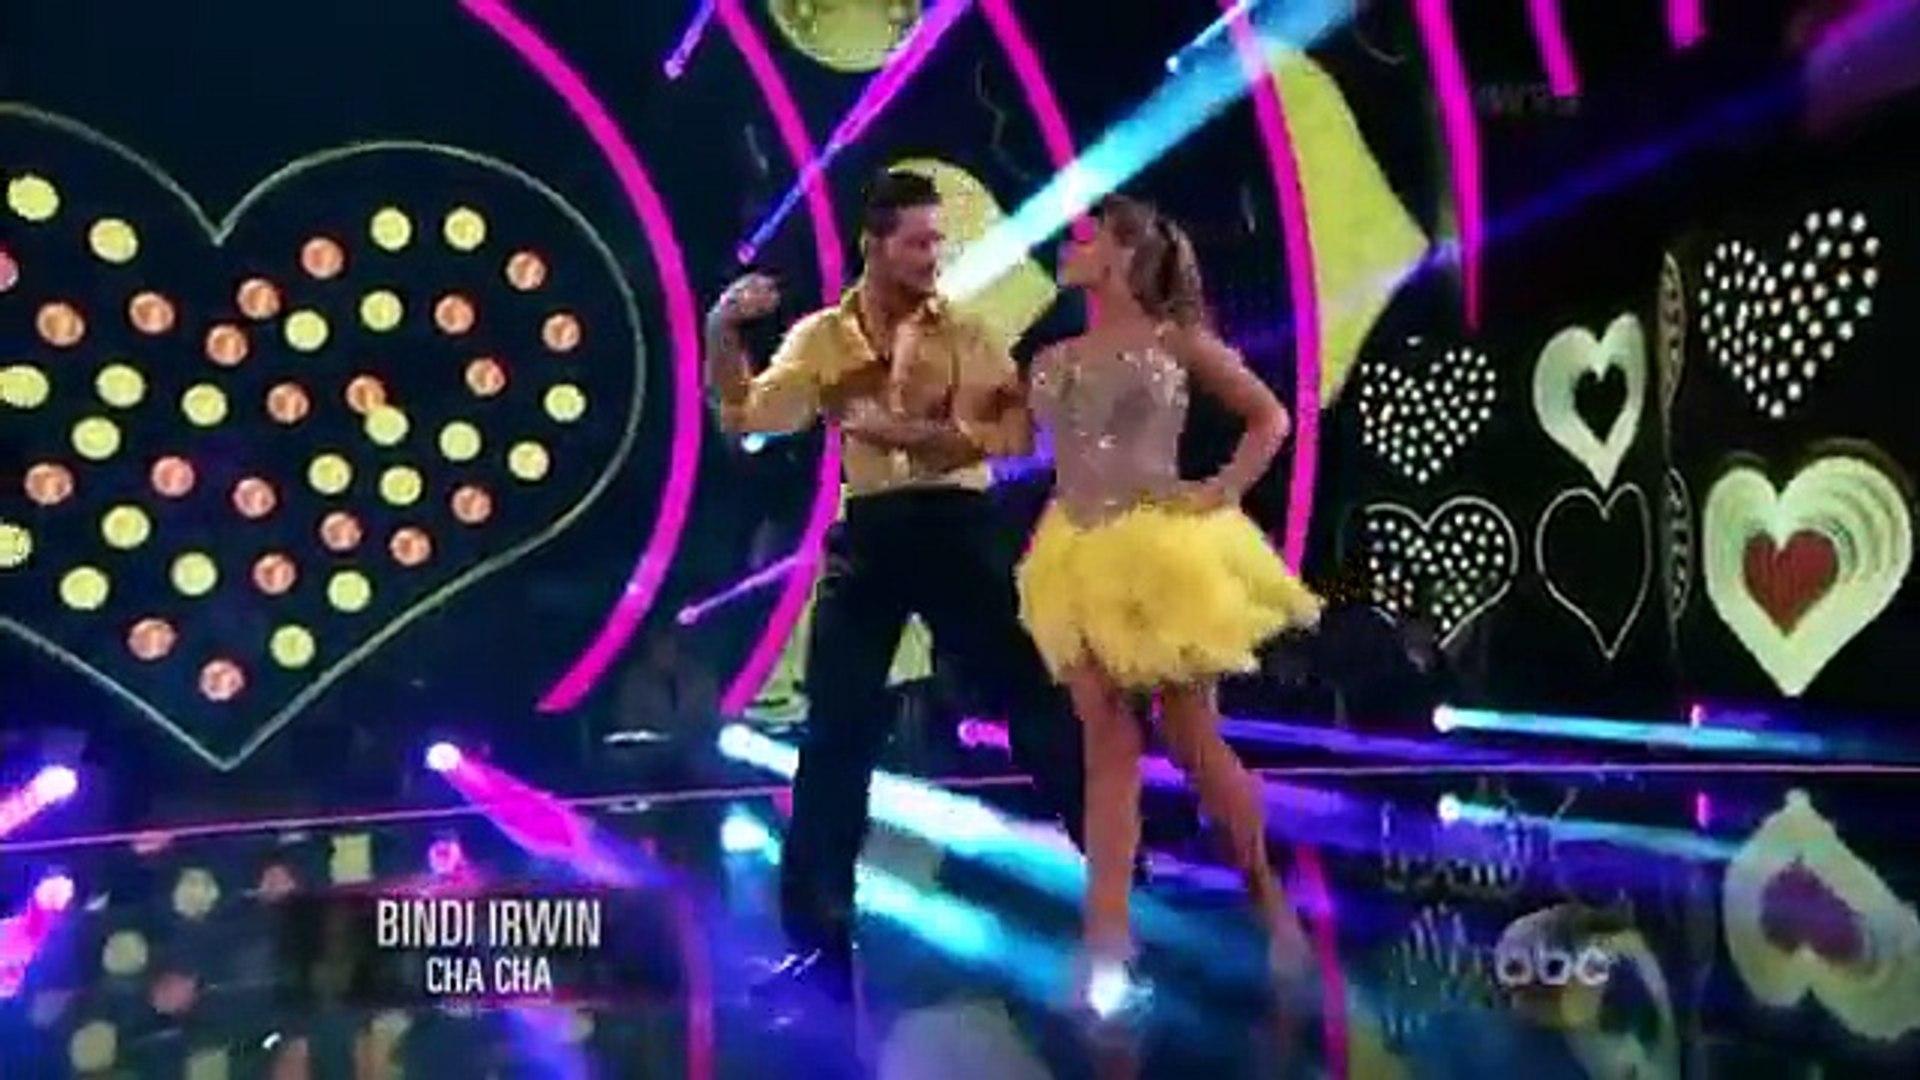 Bindi Irwin Vals Cha Cha Dancing With The Stars Week 5 Dwts Season 21